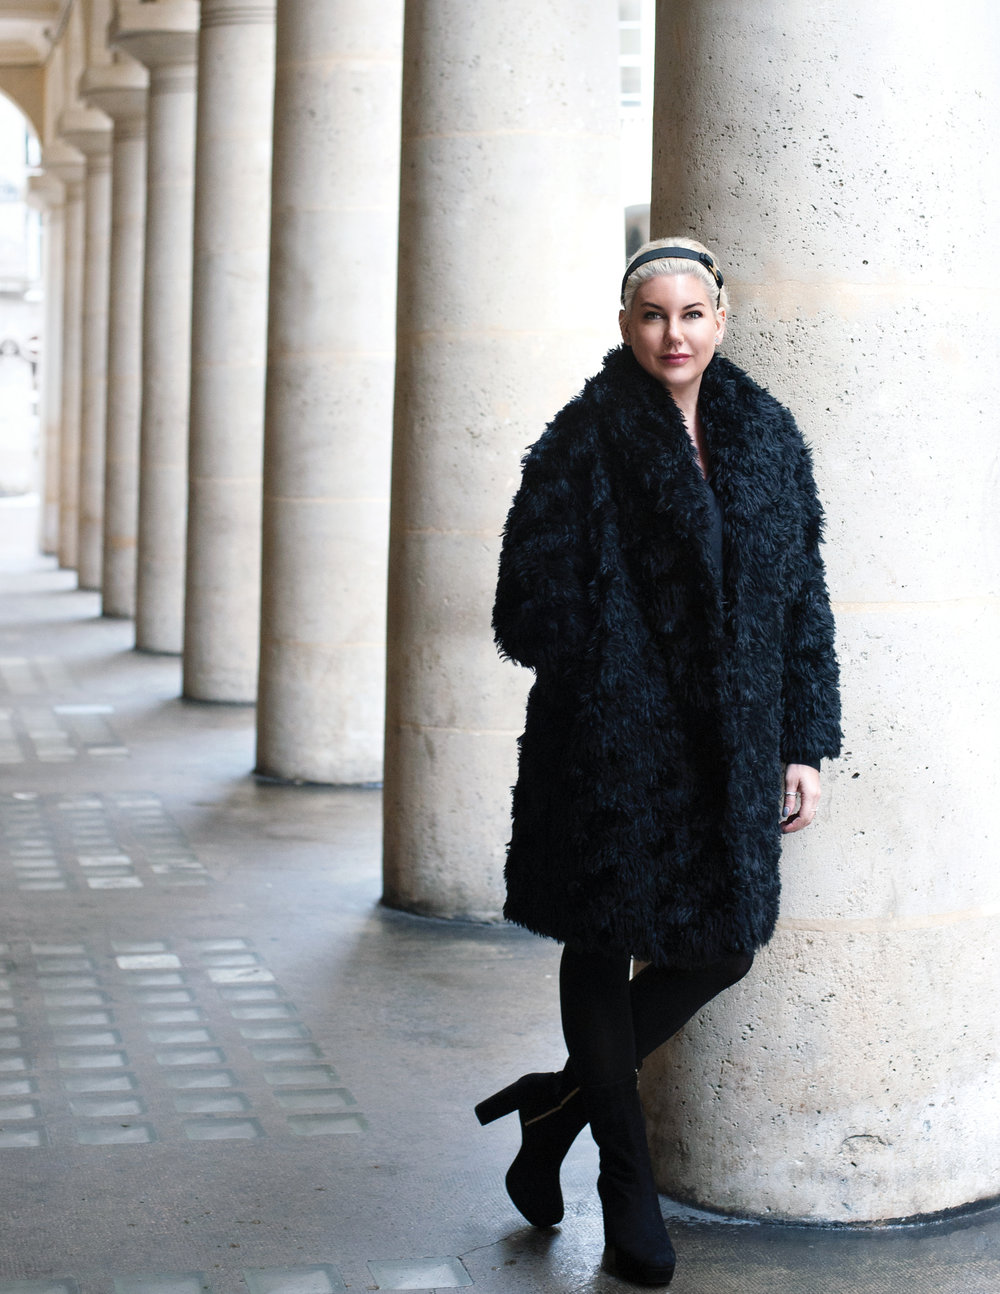 bb4f7-janette-ewen-fashion-black-coat.jpg